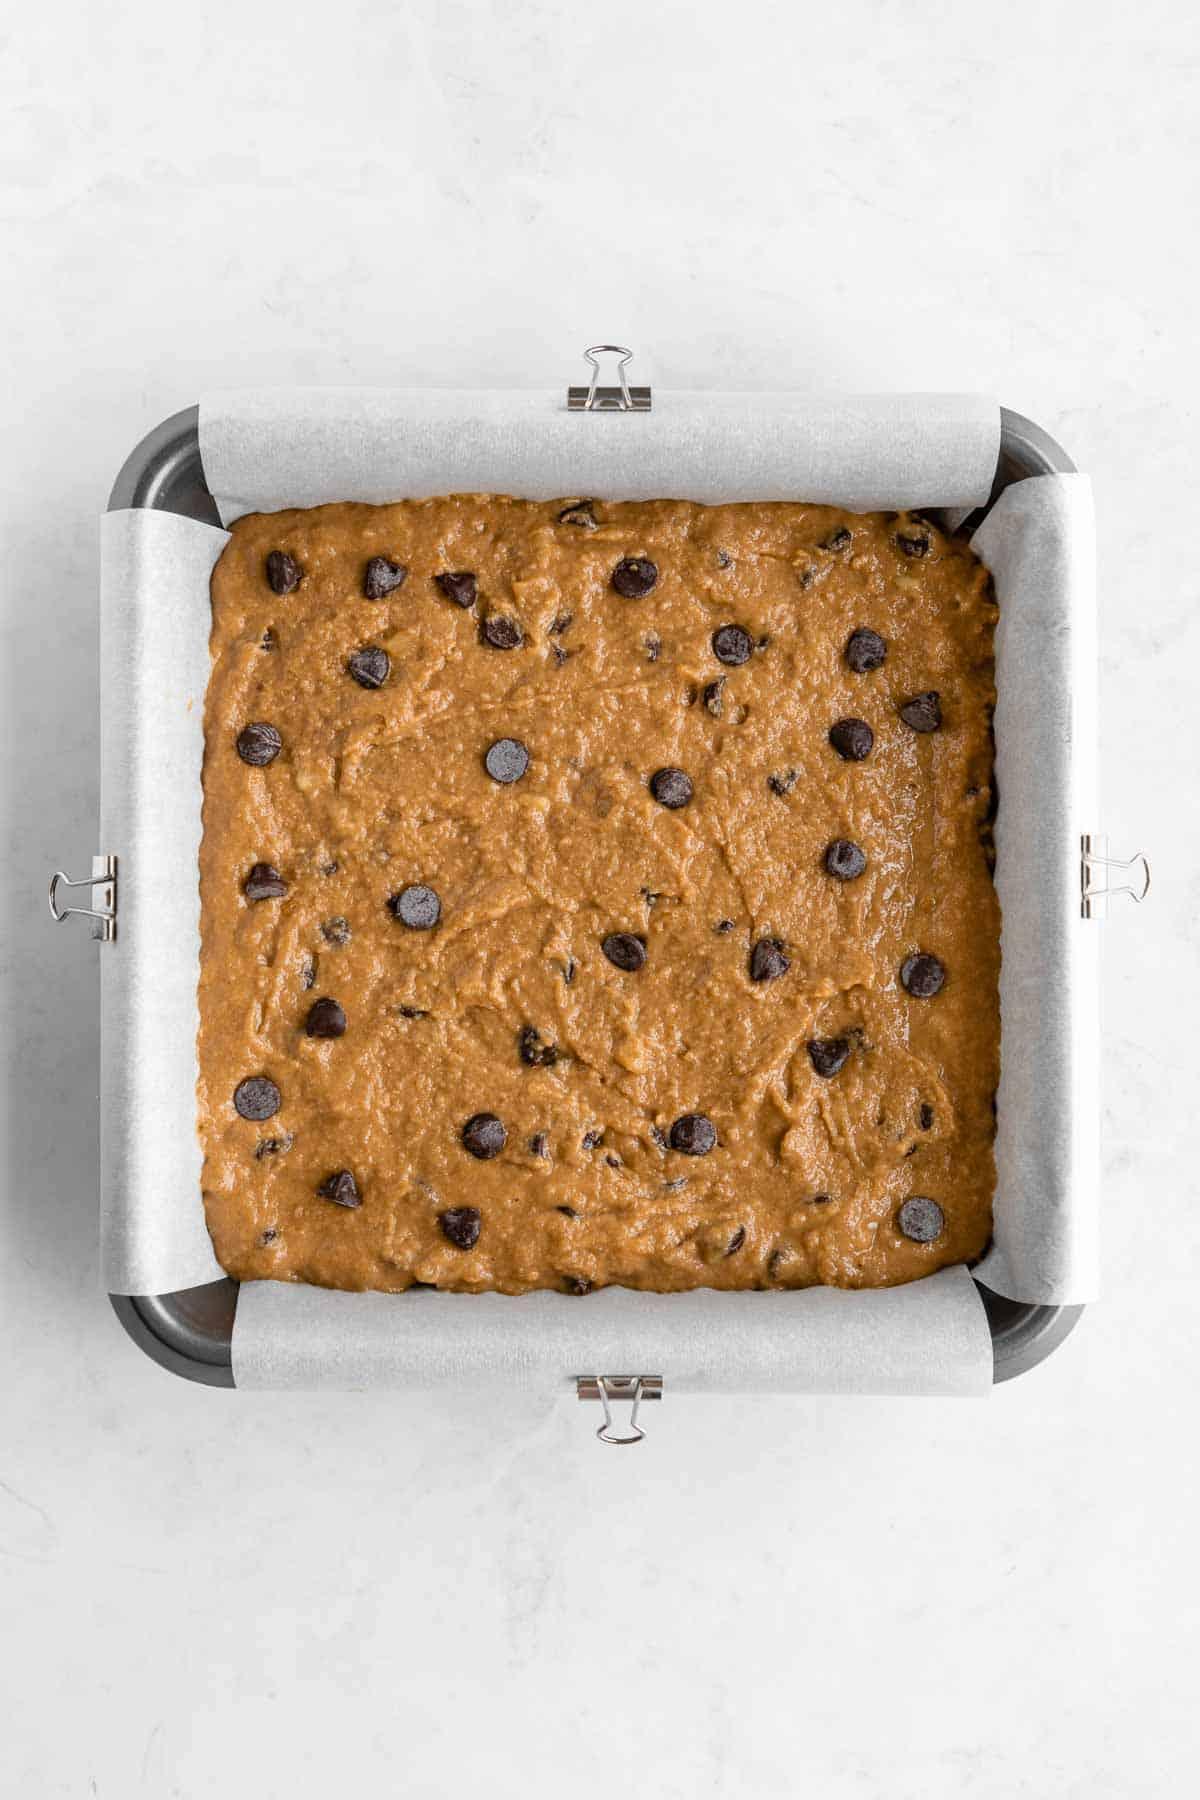 vegan gluten-free chocolate chip banana blondies batter in a square baking dish